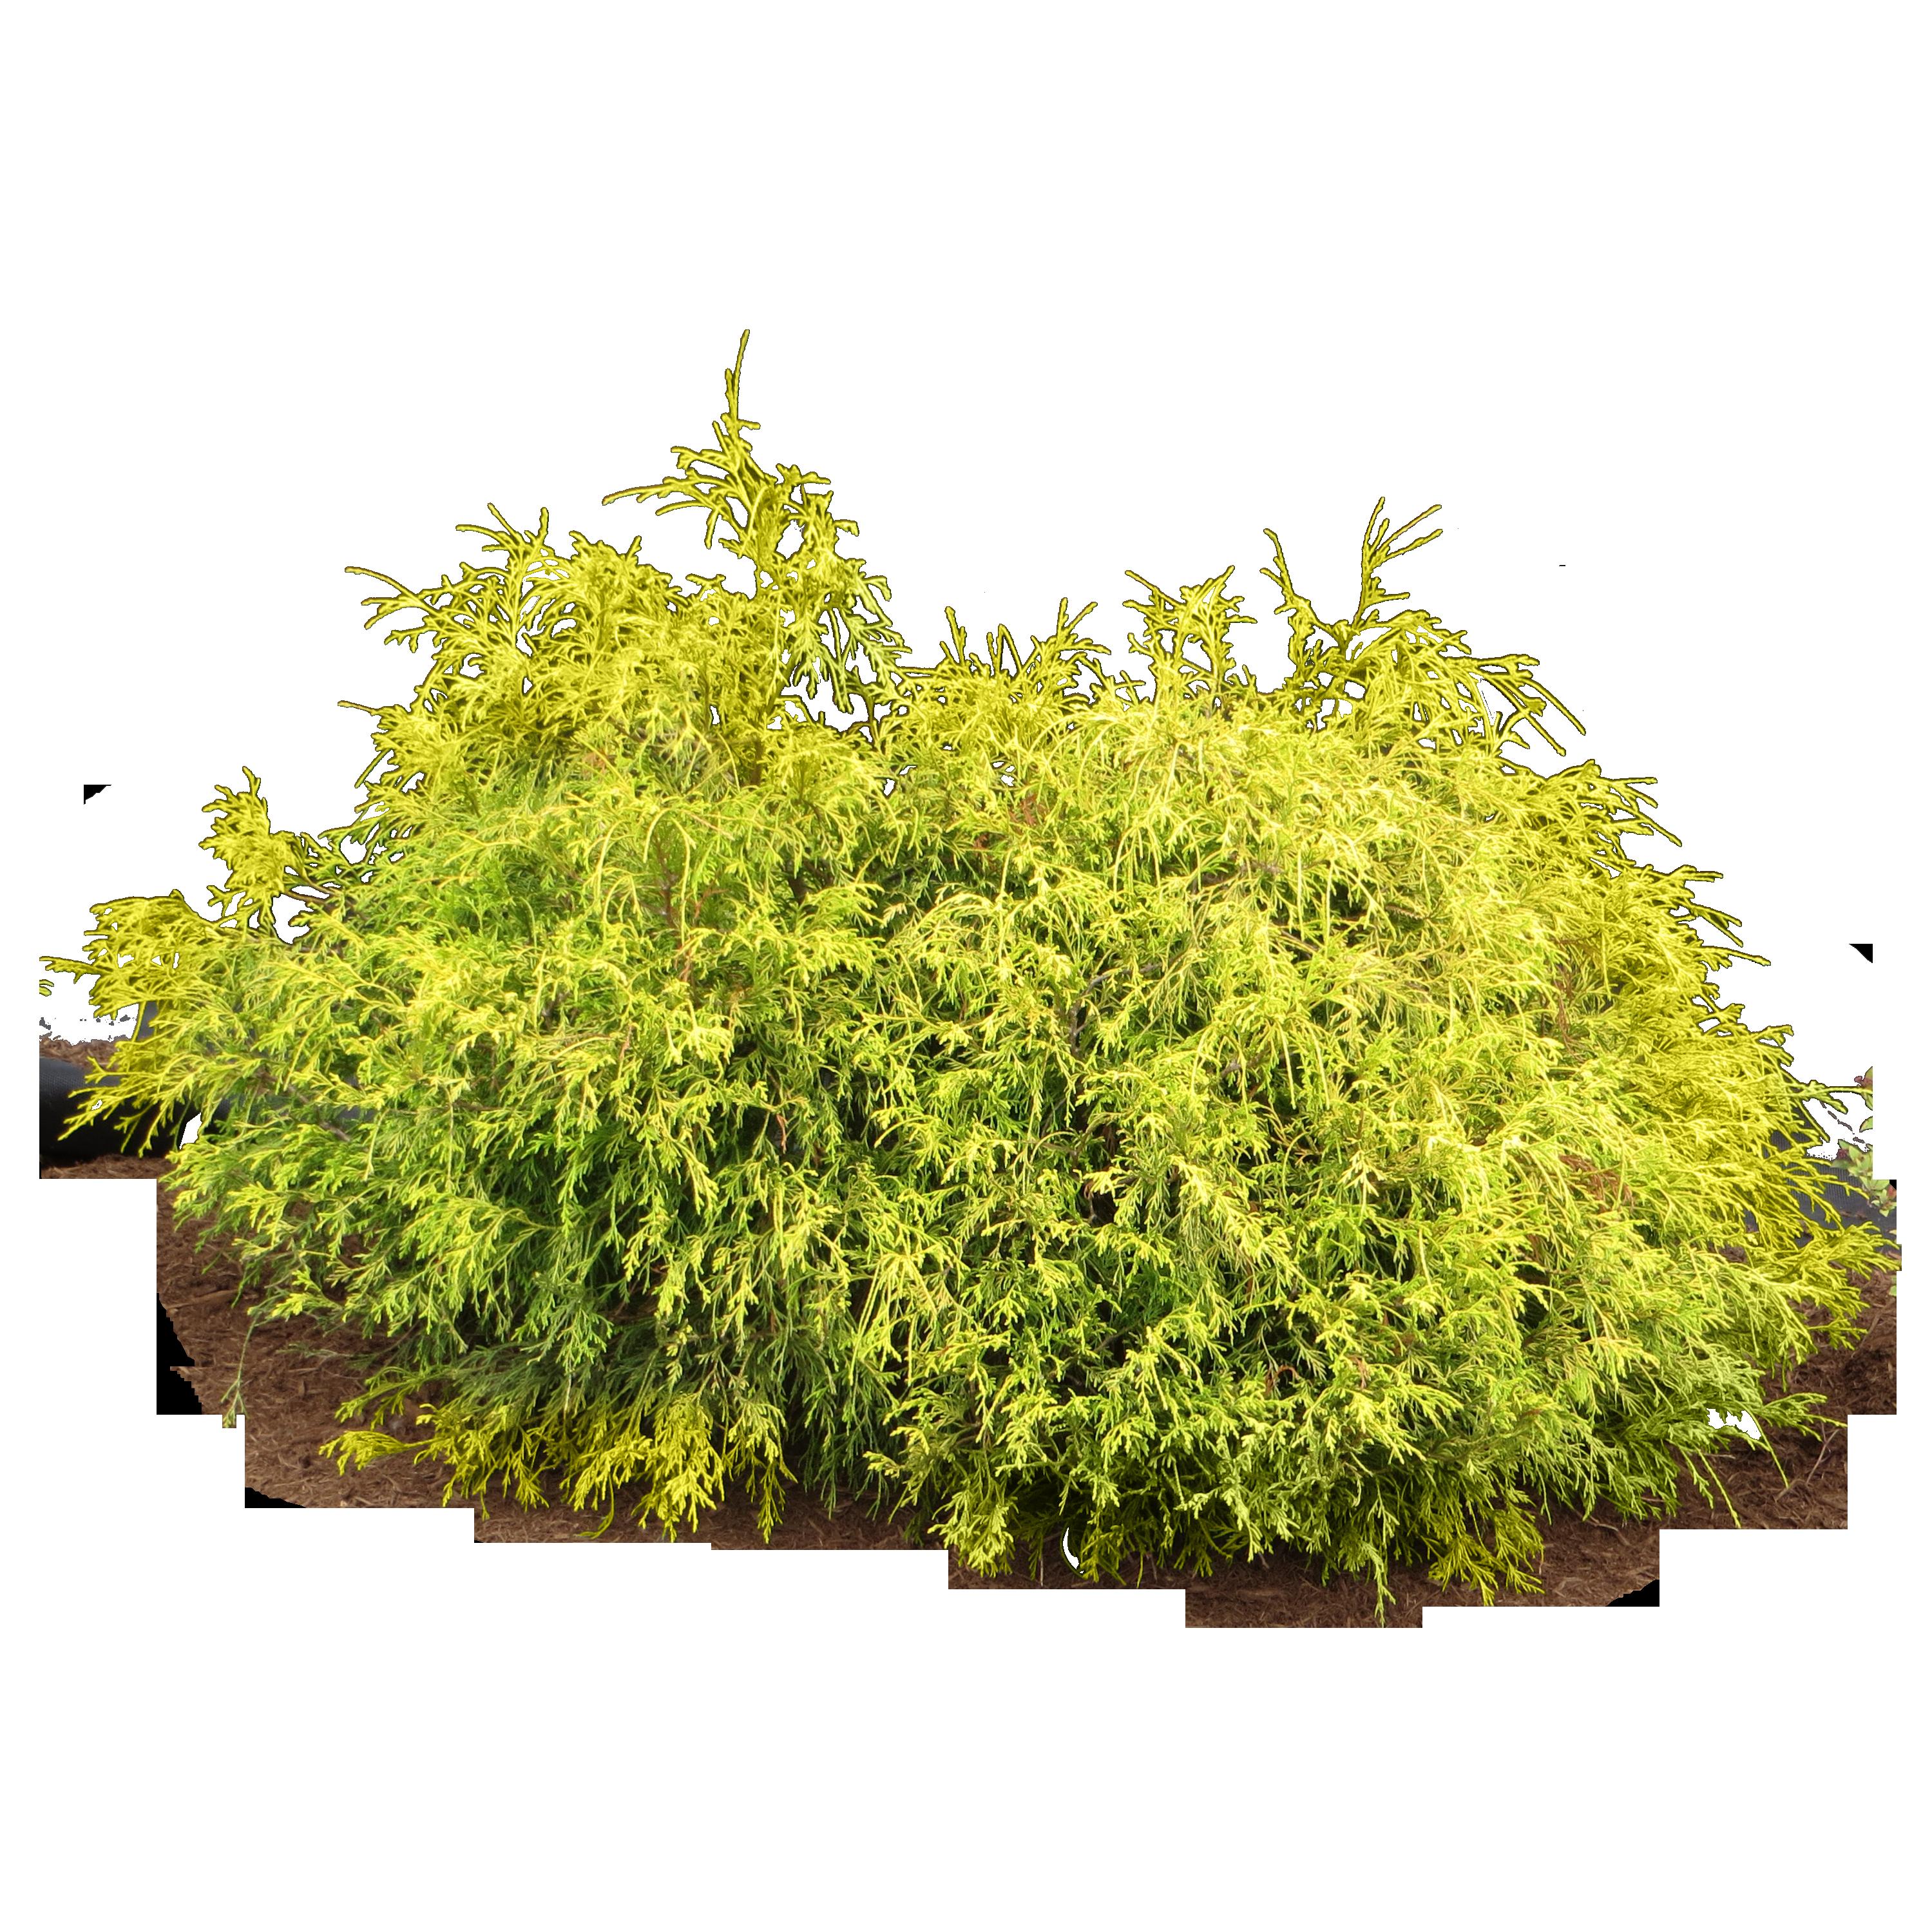 Bushes clipart shrubbery. Shrub png google search